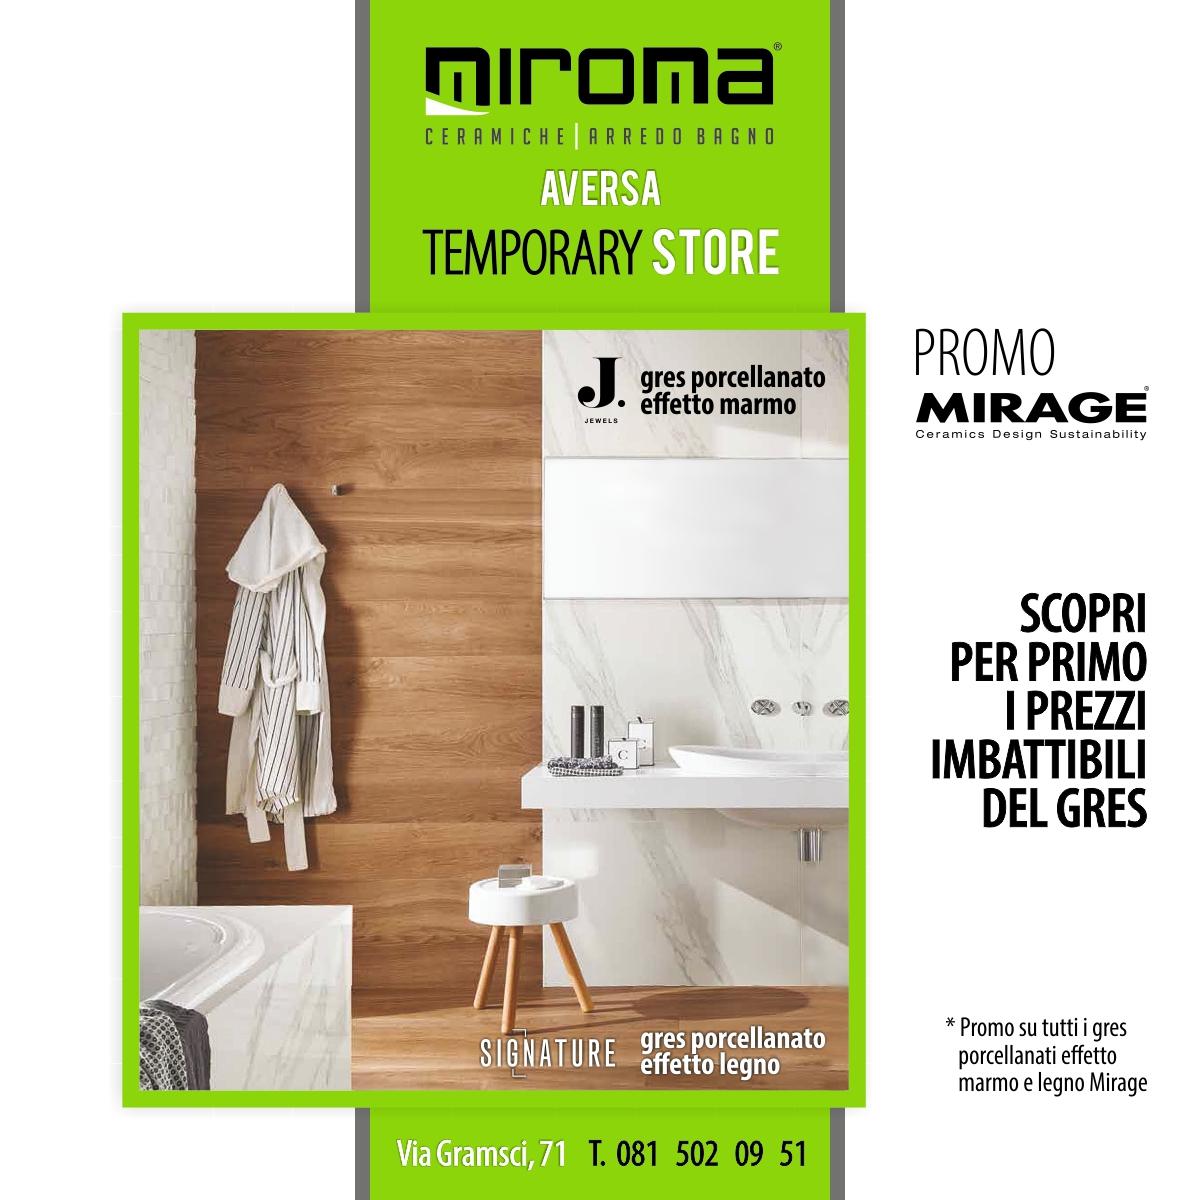 Gres_Porcellanato-Miroma